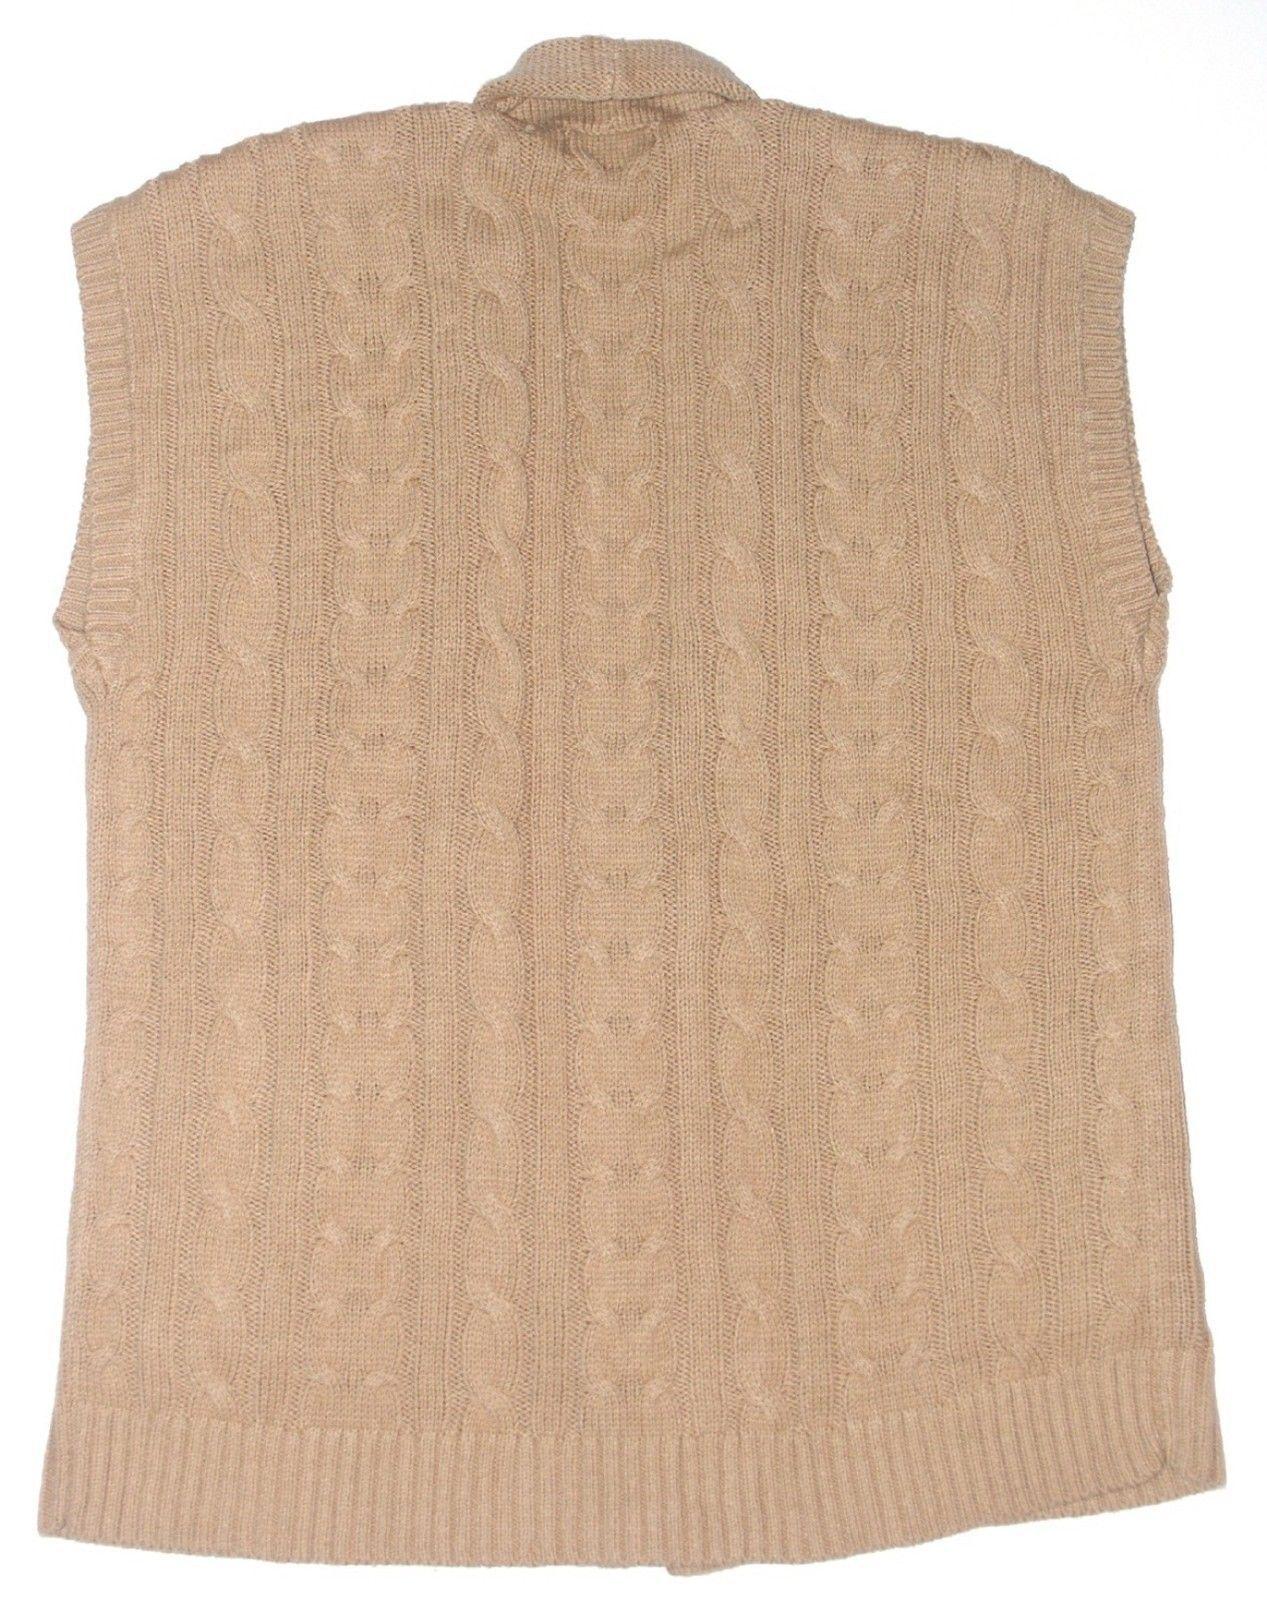 Chaps Womens Camel Tan Sweater Open Vest S M XL NEW